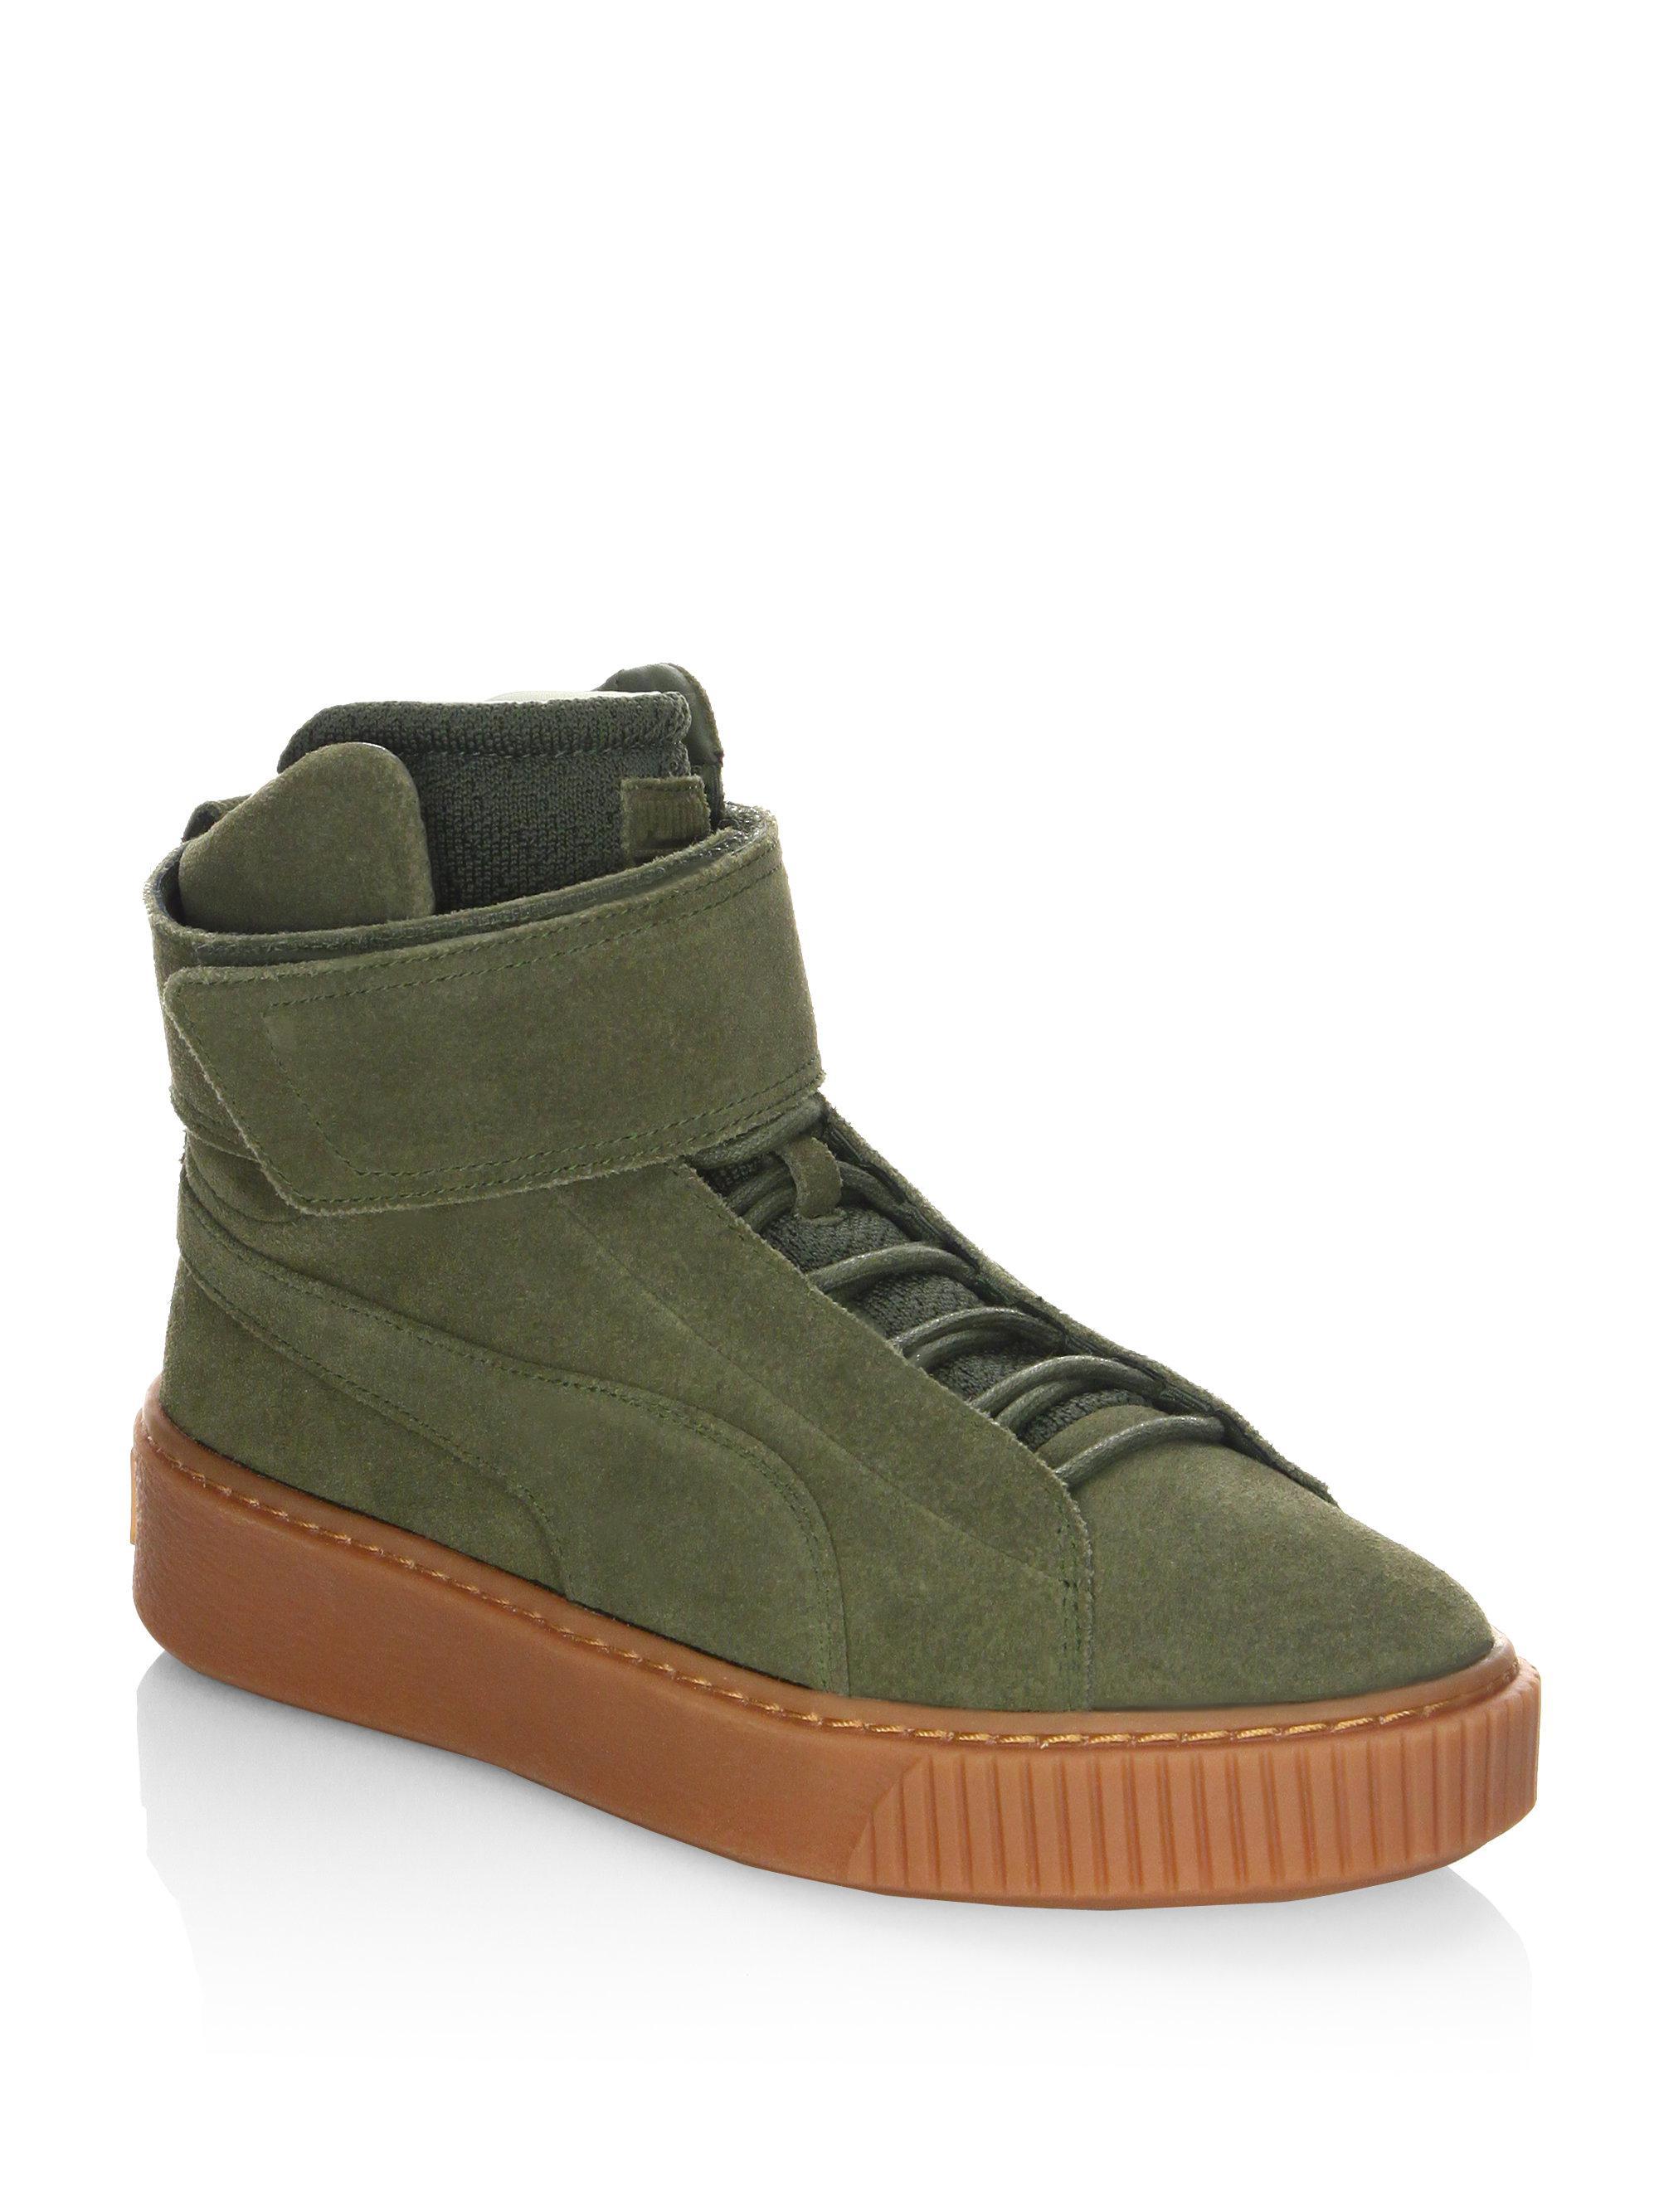 Puma Eskiva Hi Deep Summer Women US 7 Black Sneakers bGBE6ra6